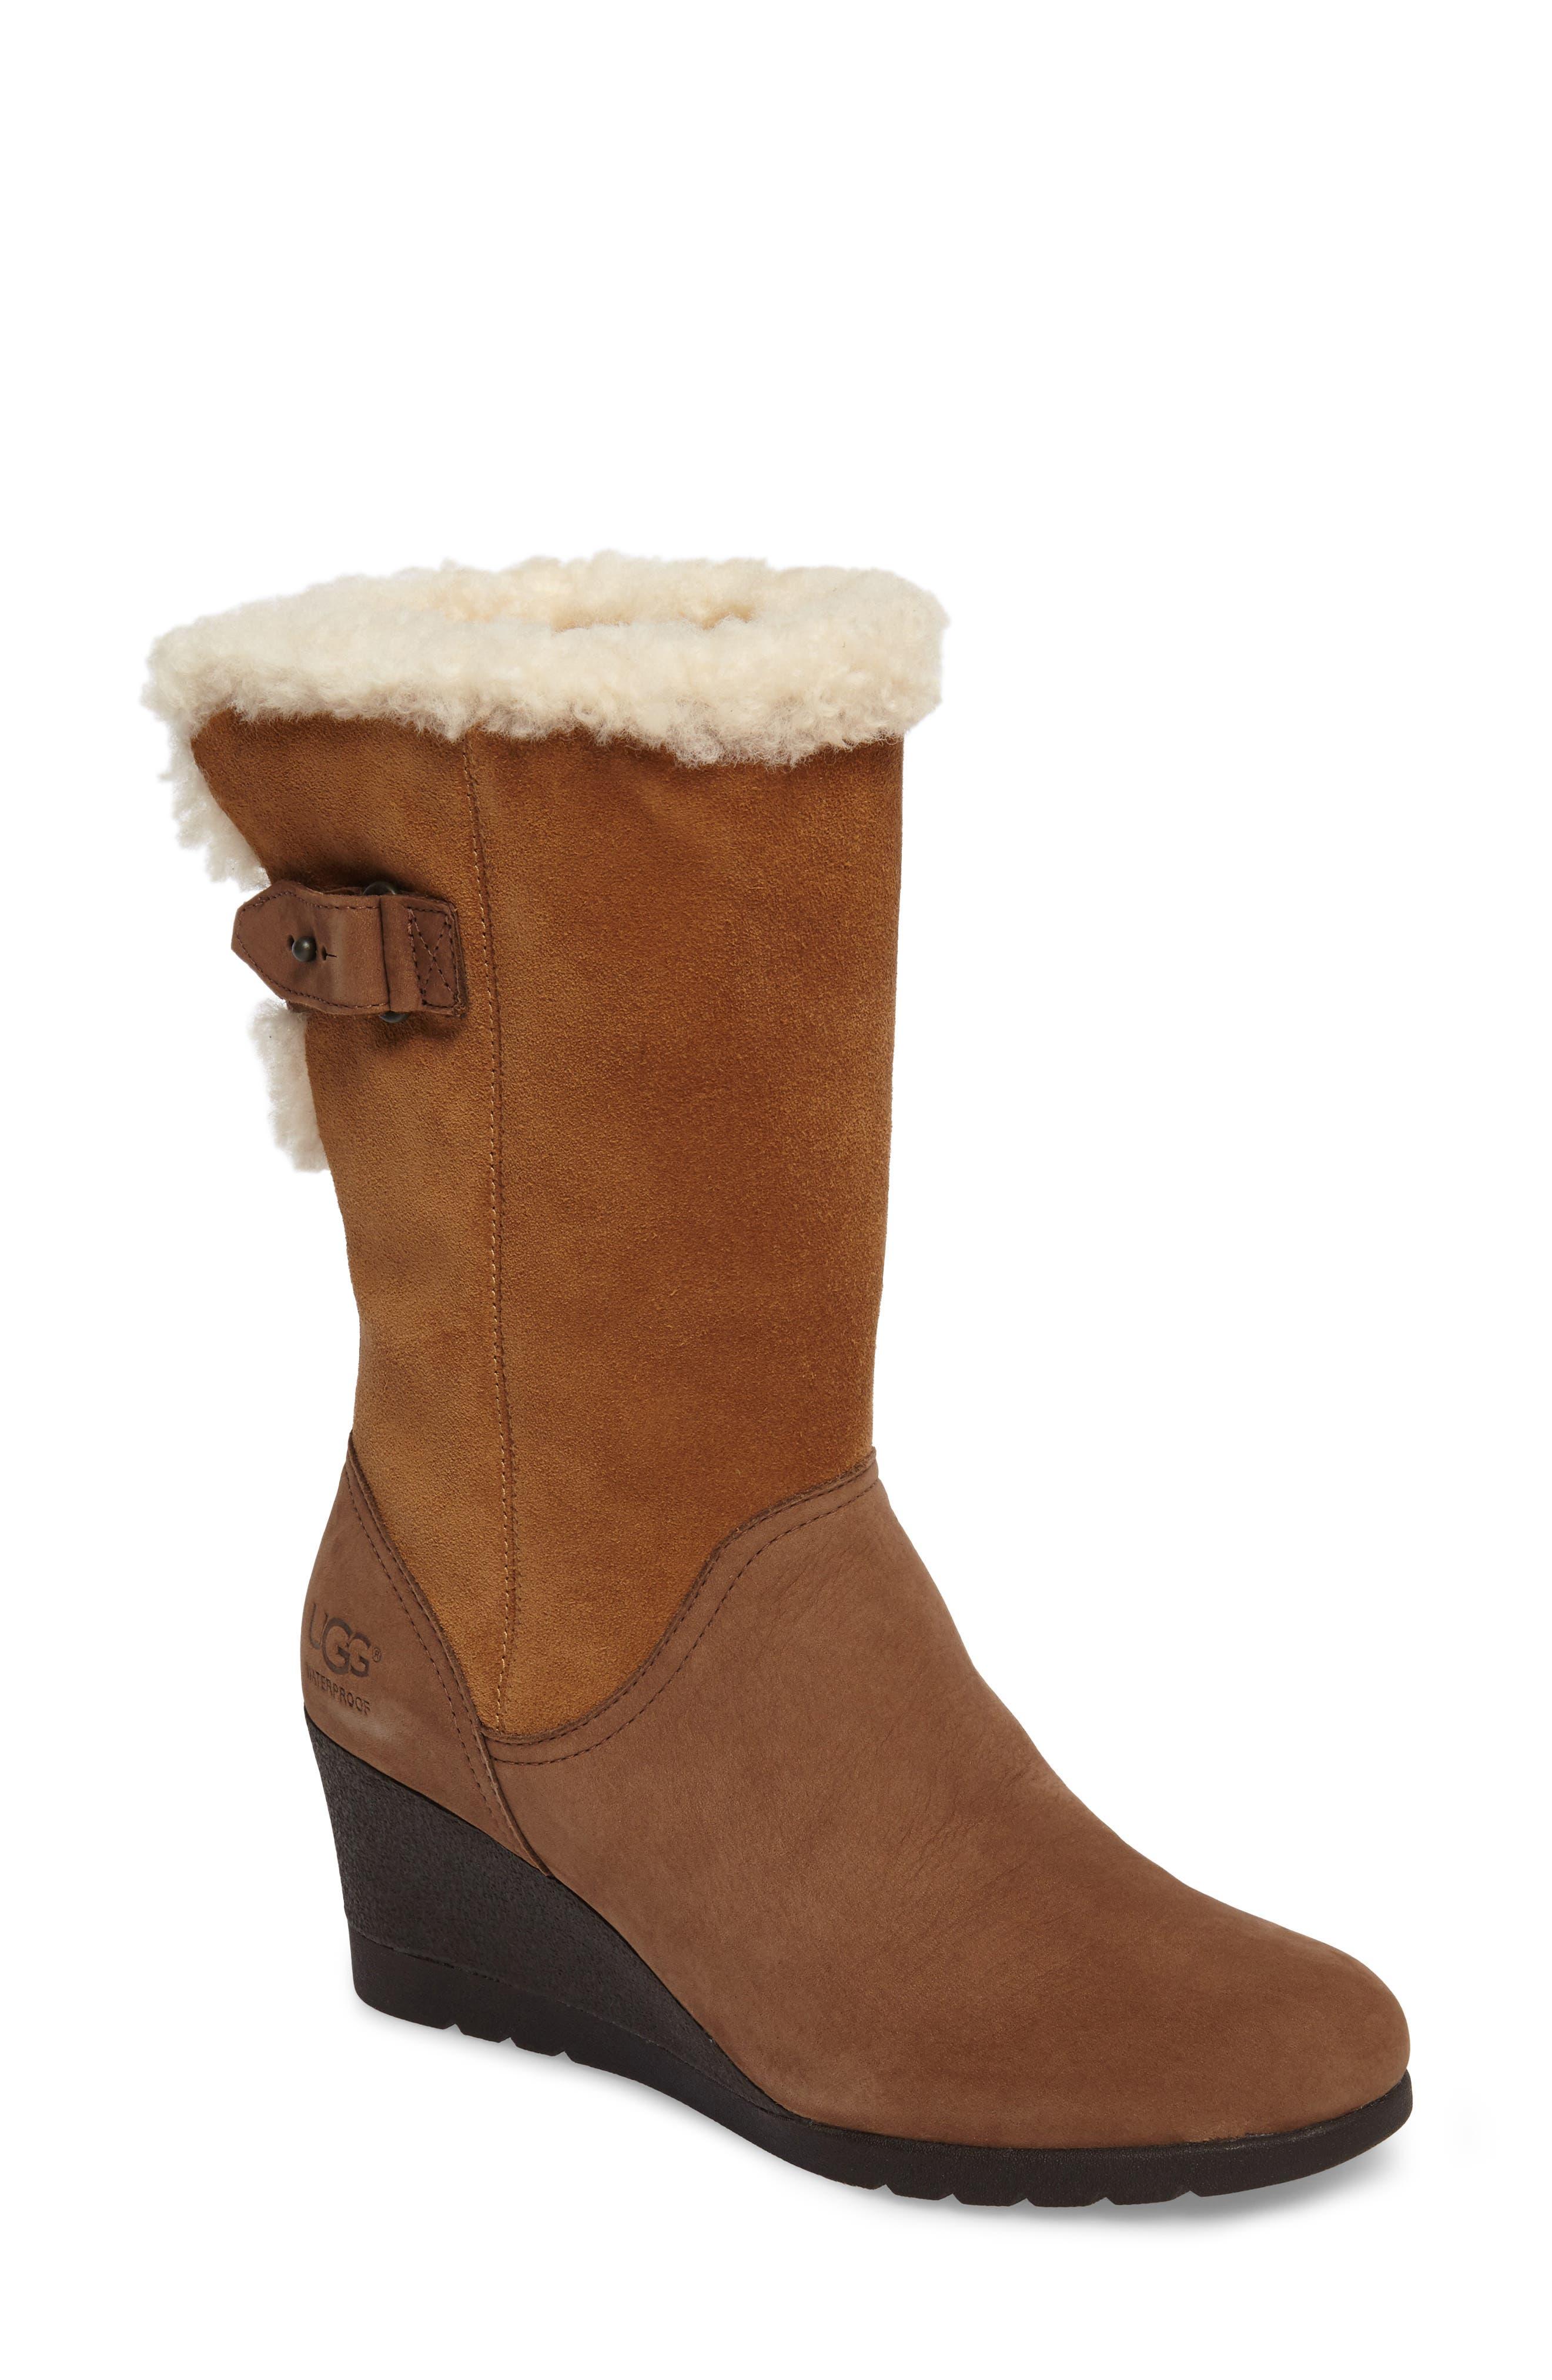 Alternate Image 1 Selected - UGG® Edelina Waterproof Wedge Boot (Women)